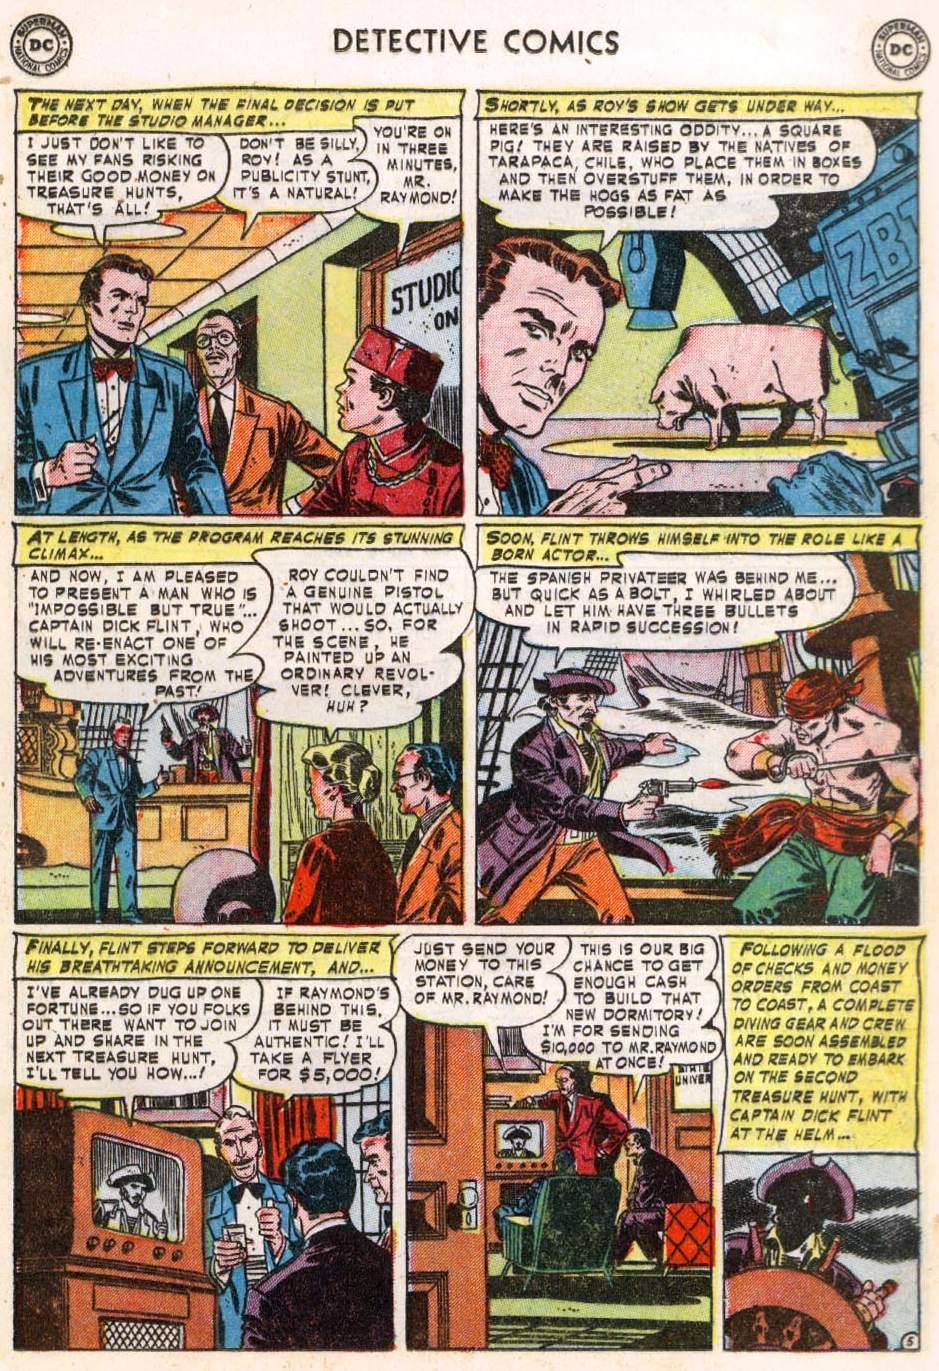 Detective Comics (1937) 183 Page 20